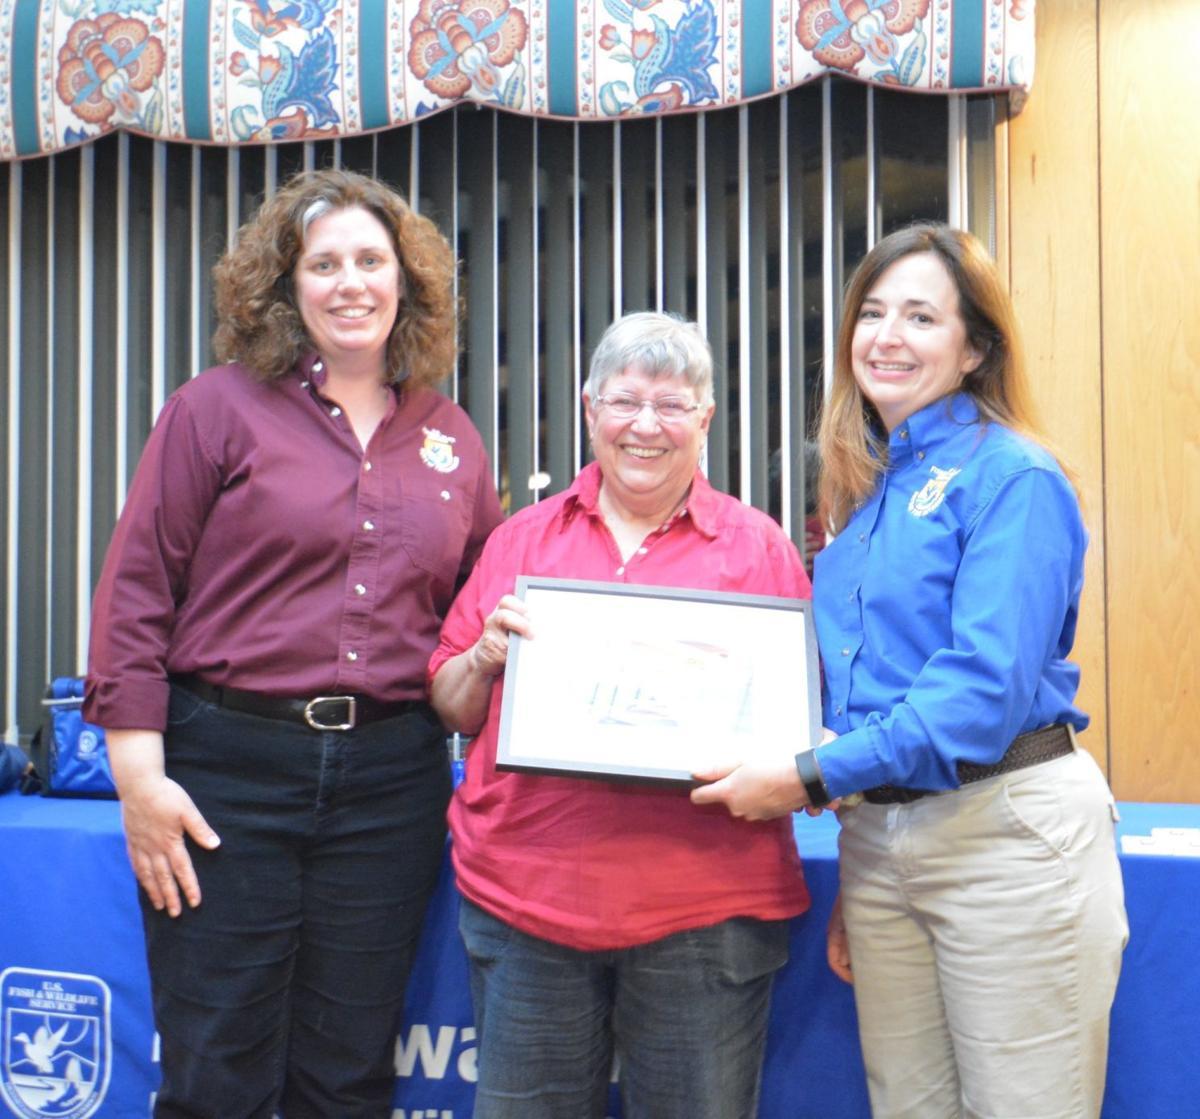 U.S. Fish and Wildlife recognizes Blackwater volunteers